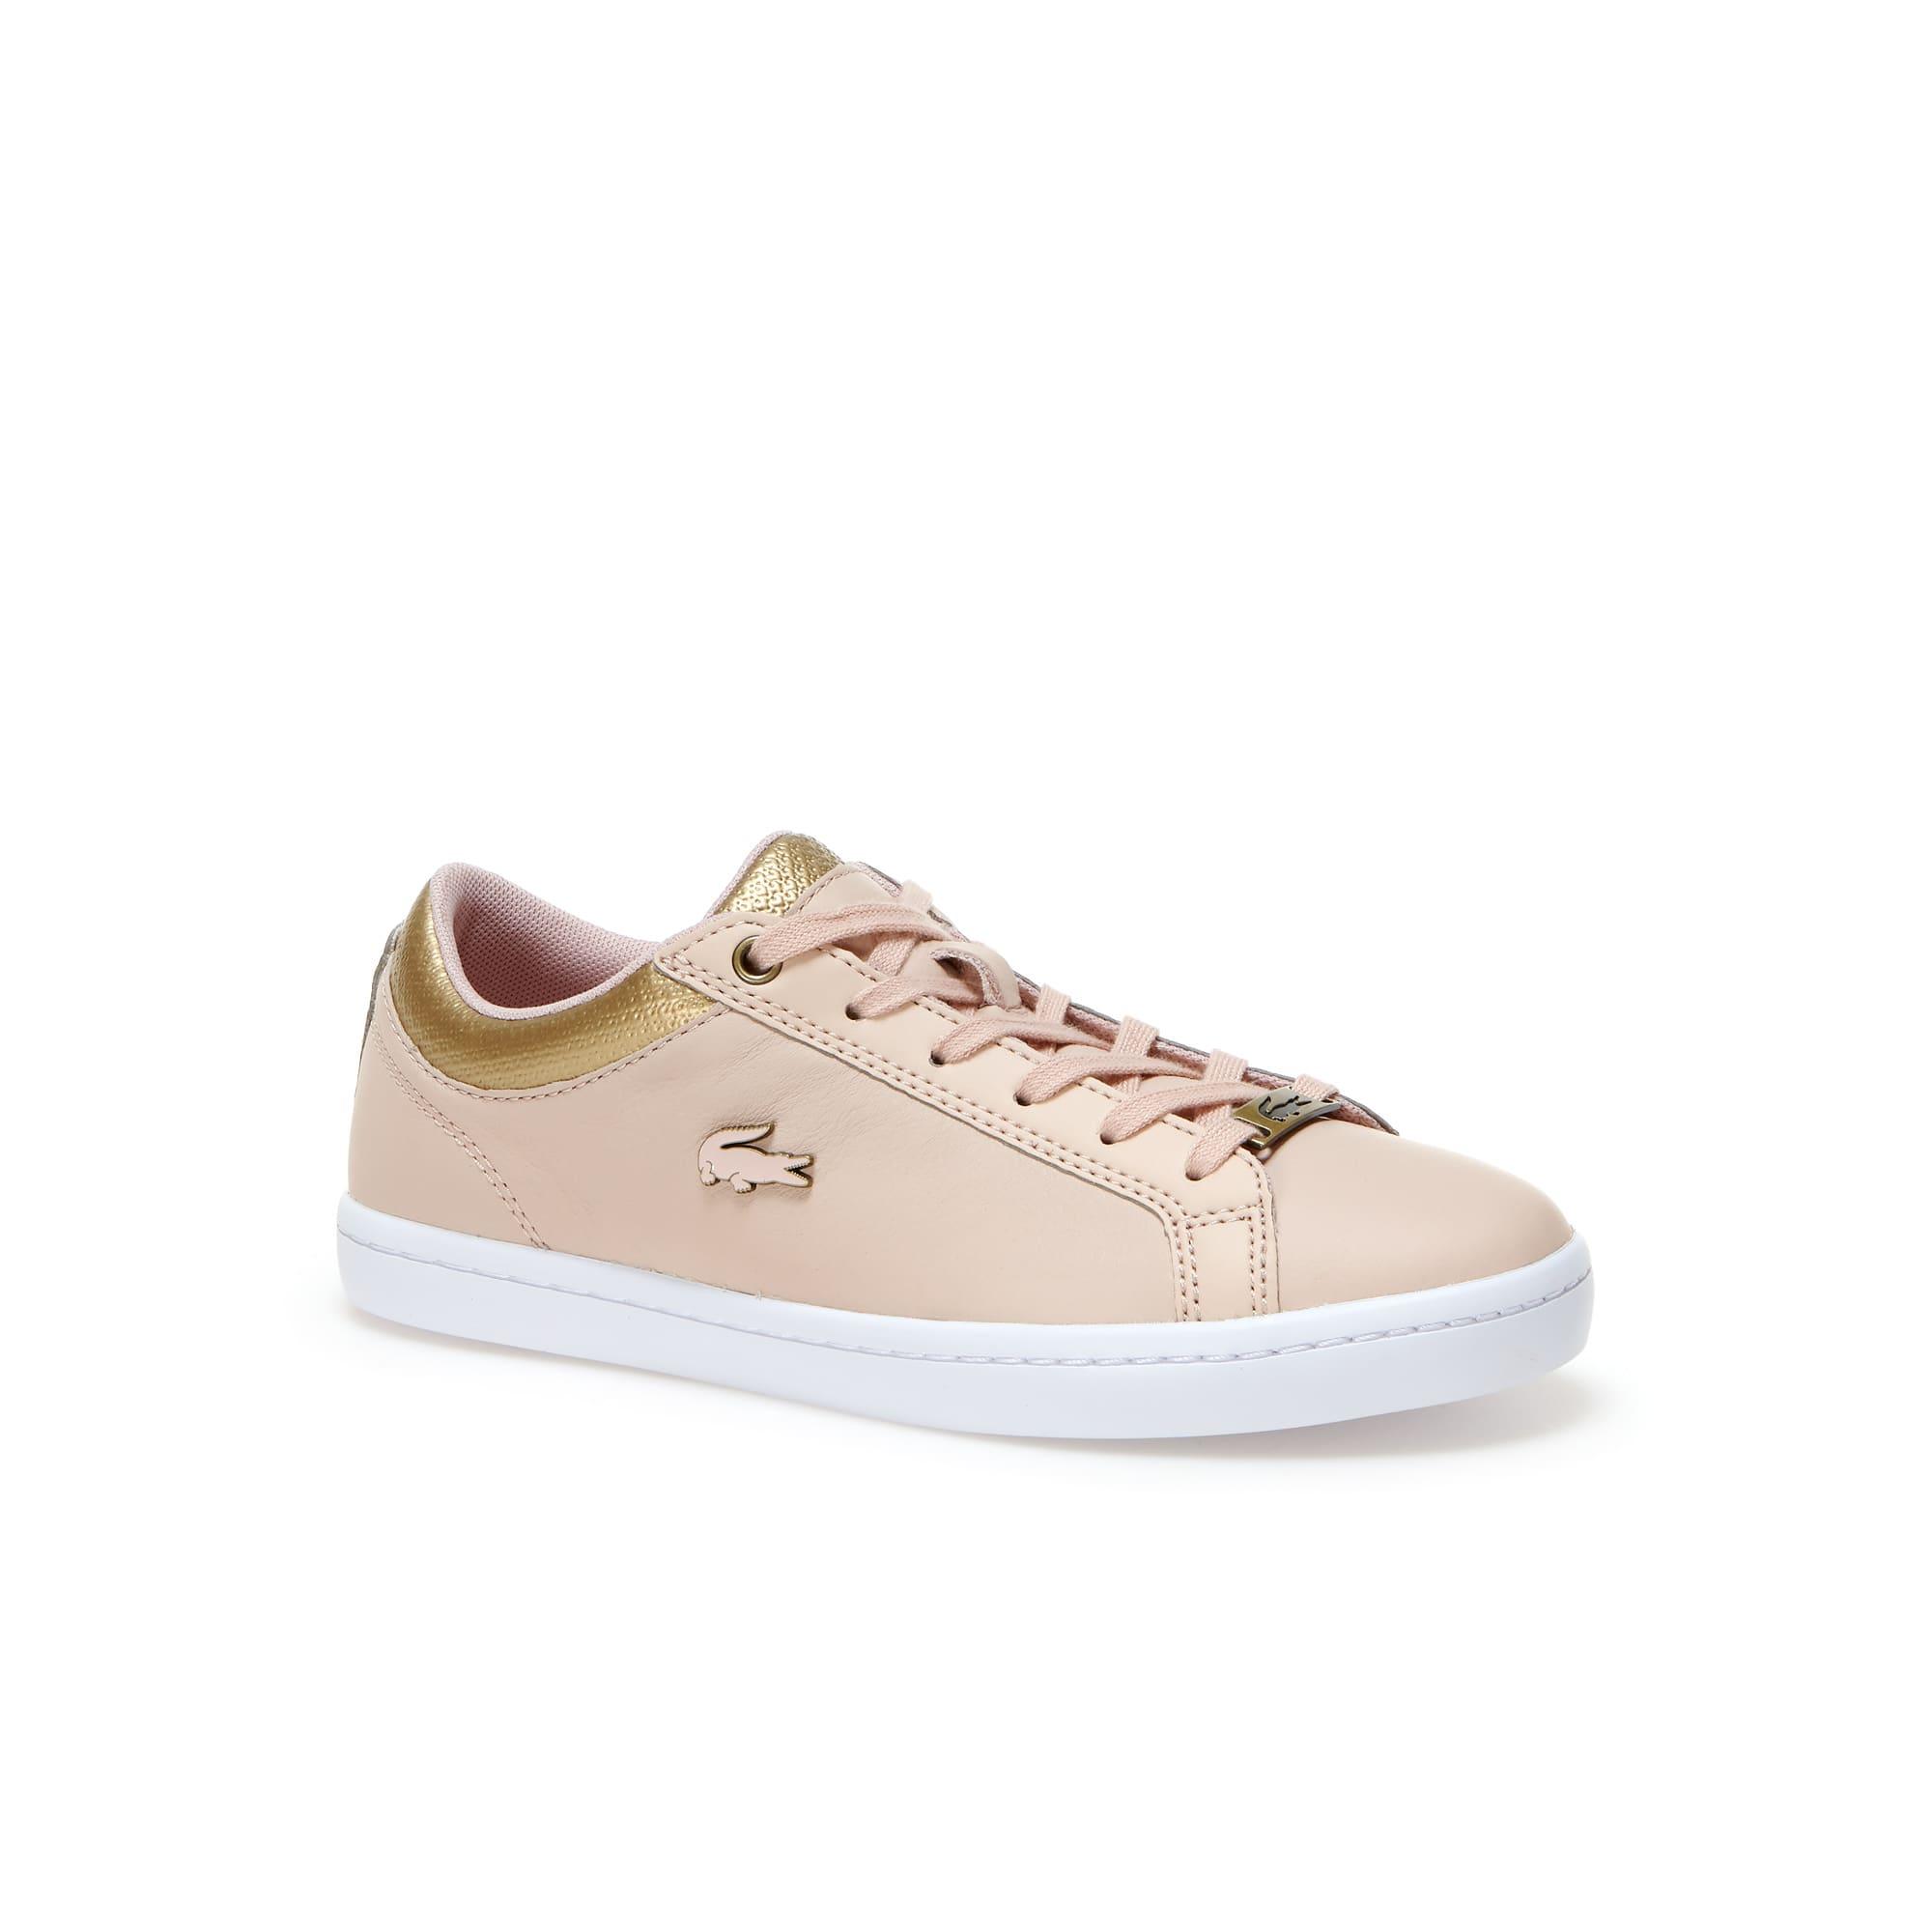 Sneakers Straightset en cuir froissé